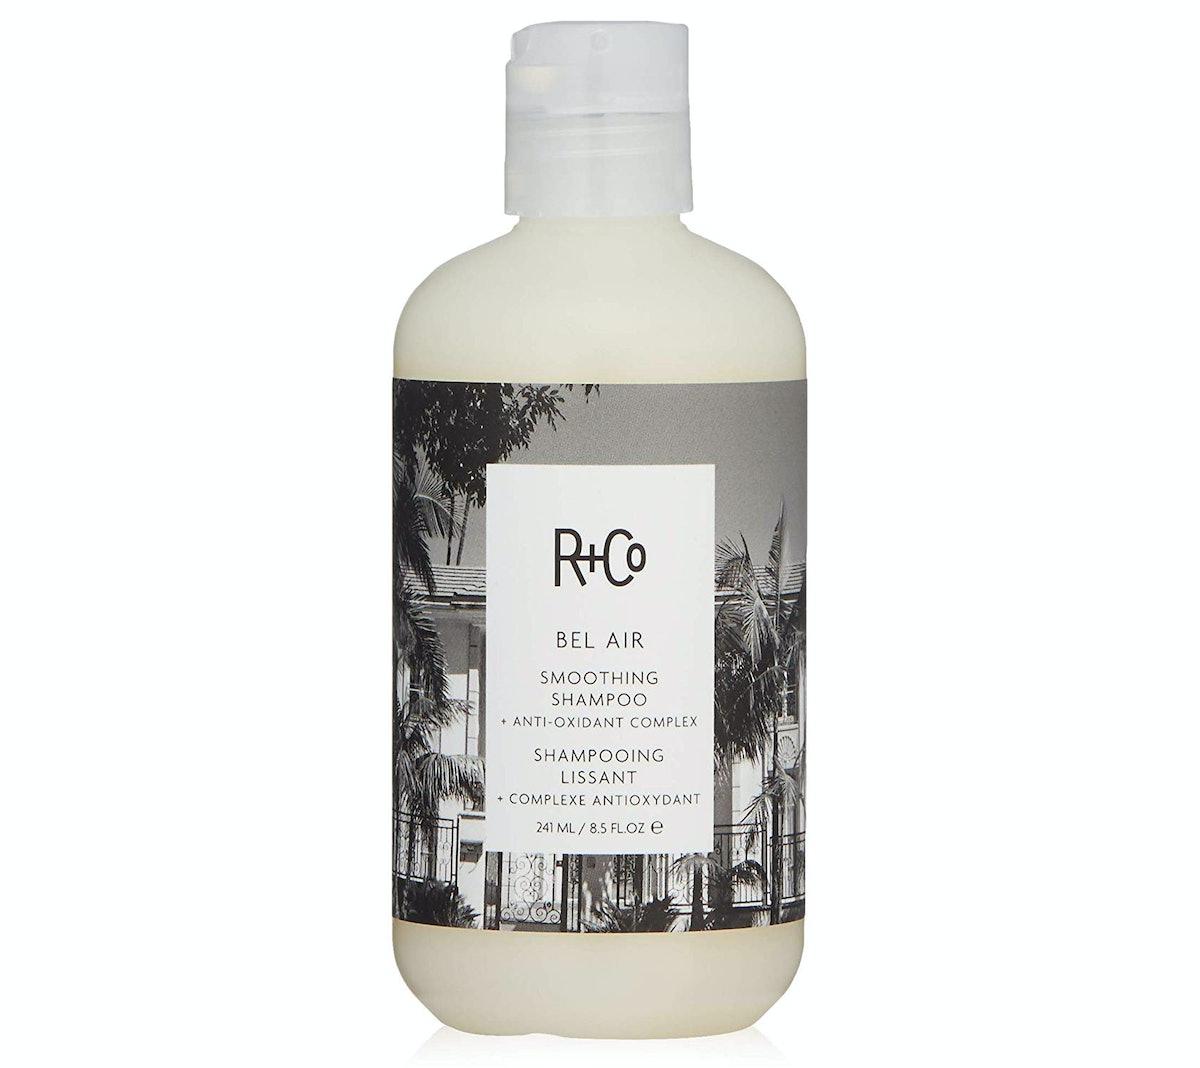 Bel Air Smoothing Shampoo + Anti-Oxidant Complex